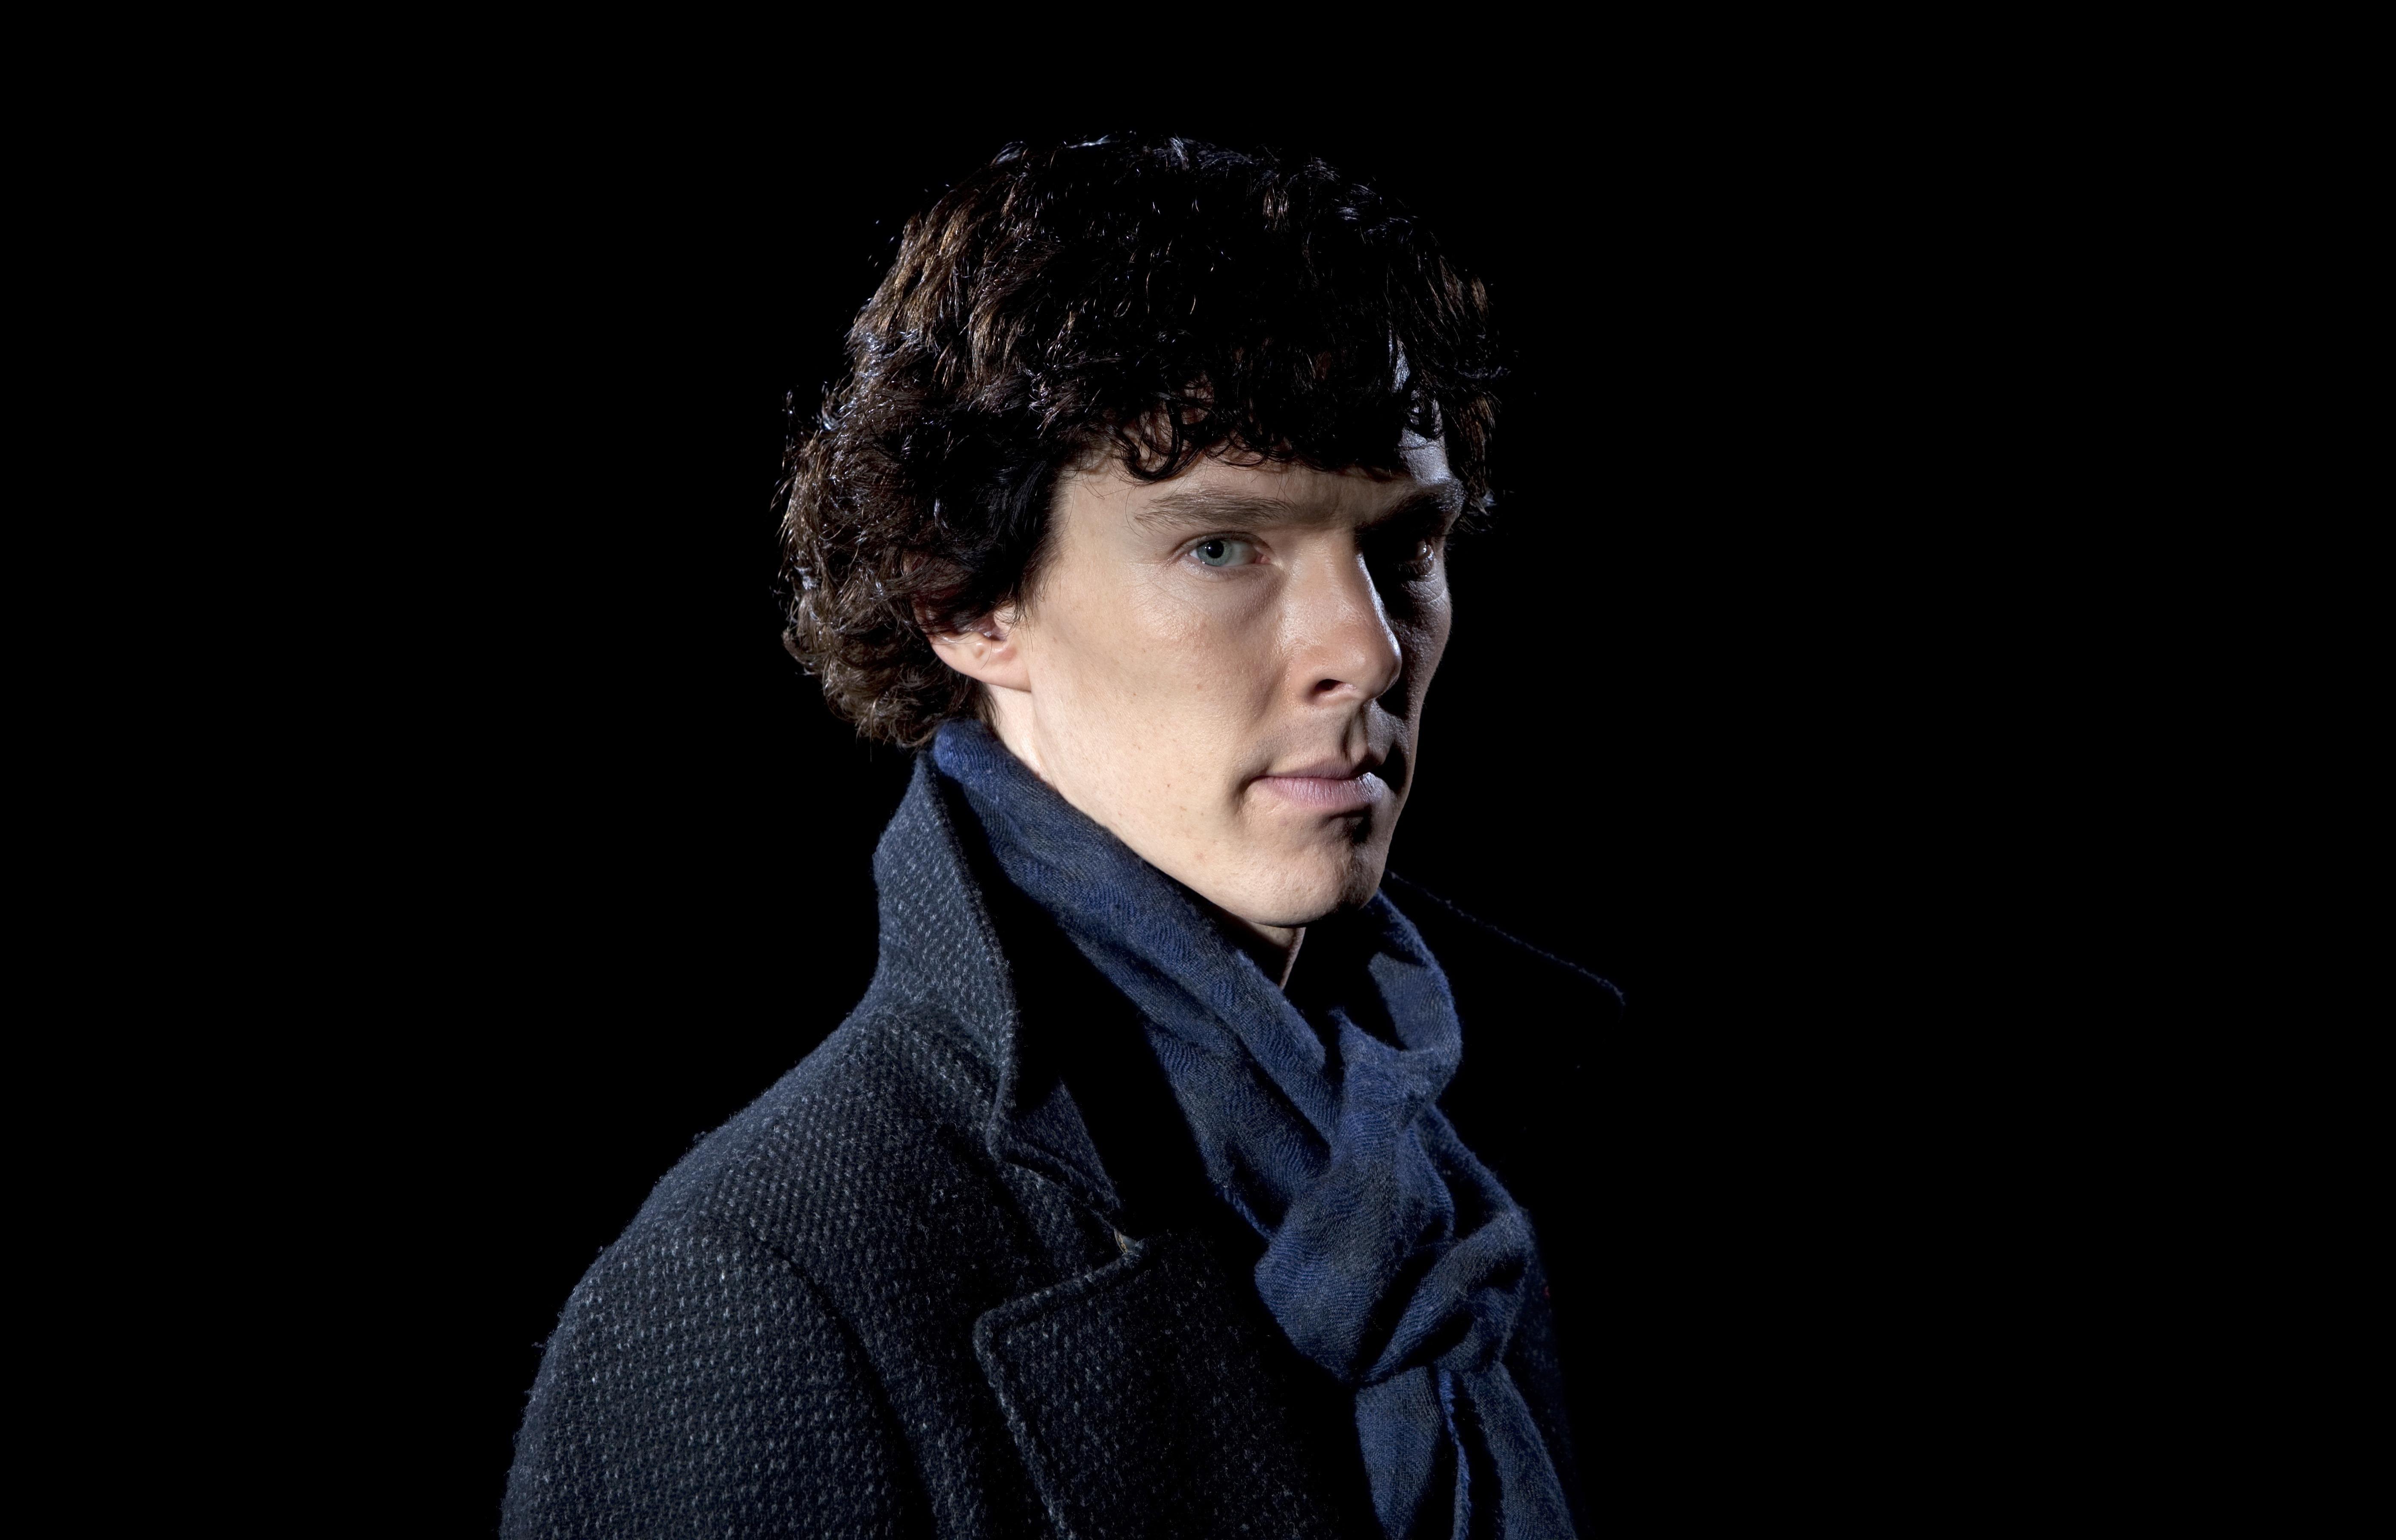 Бенедикт Камбербетч в роли Шерлока